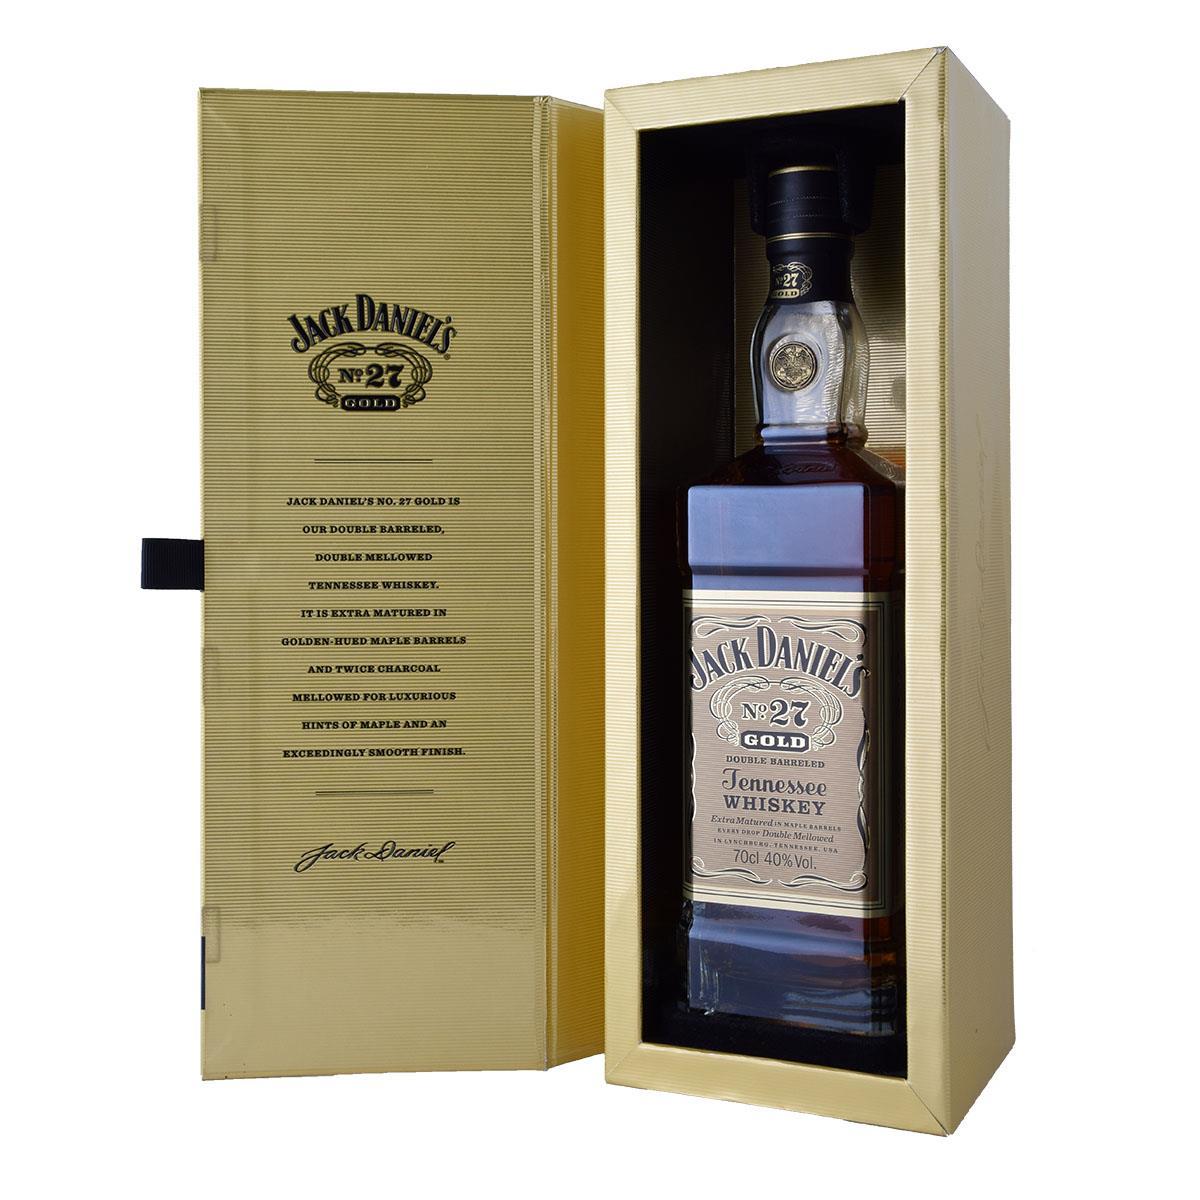 Jack Daniels Gold No27 700ml